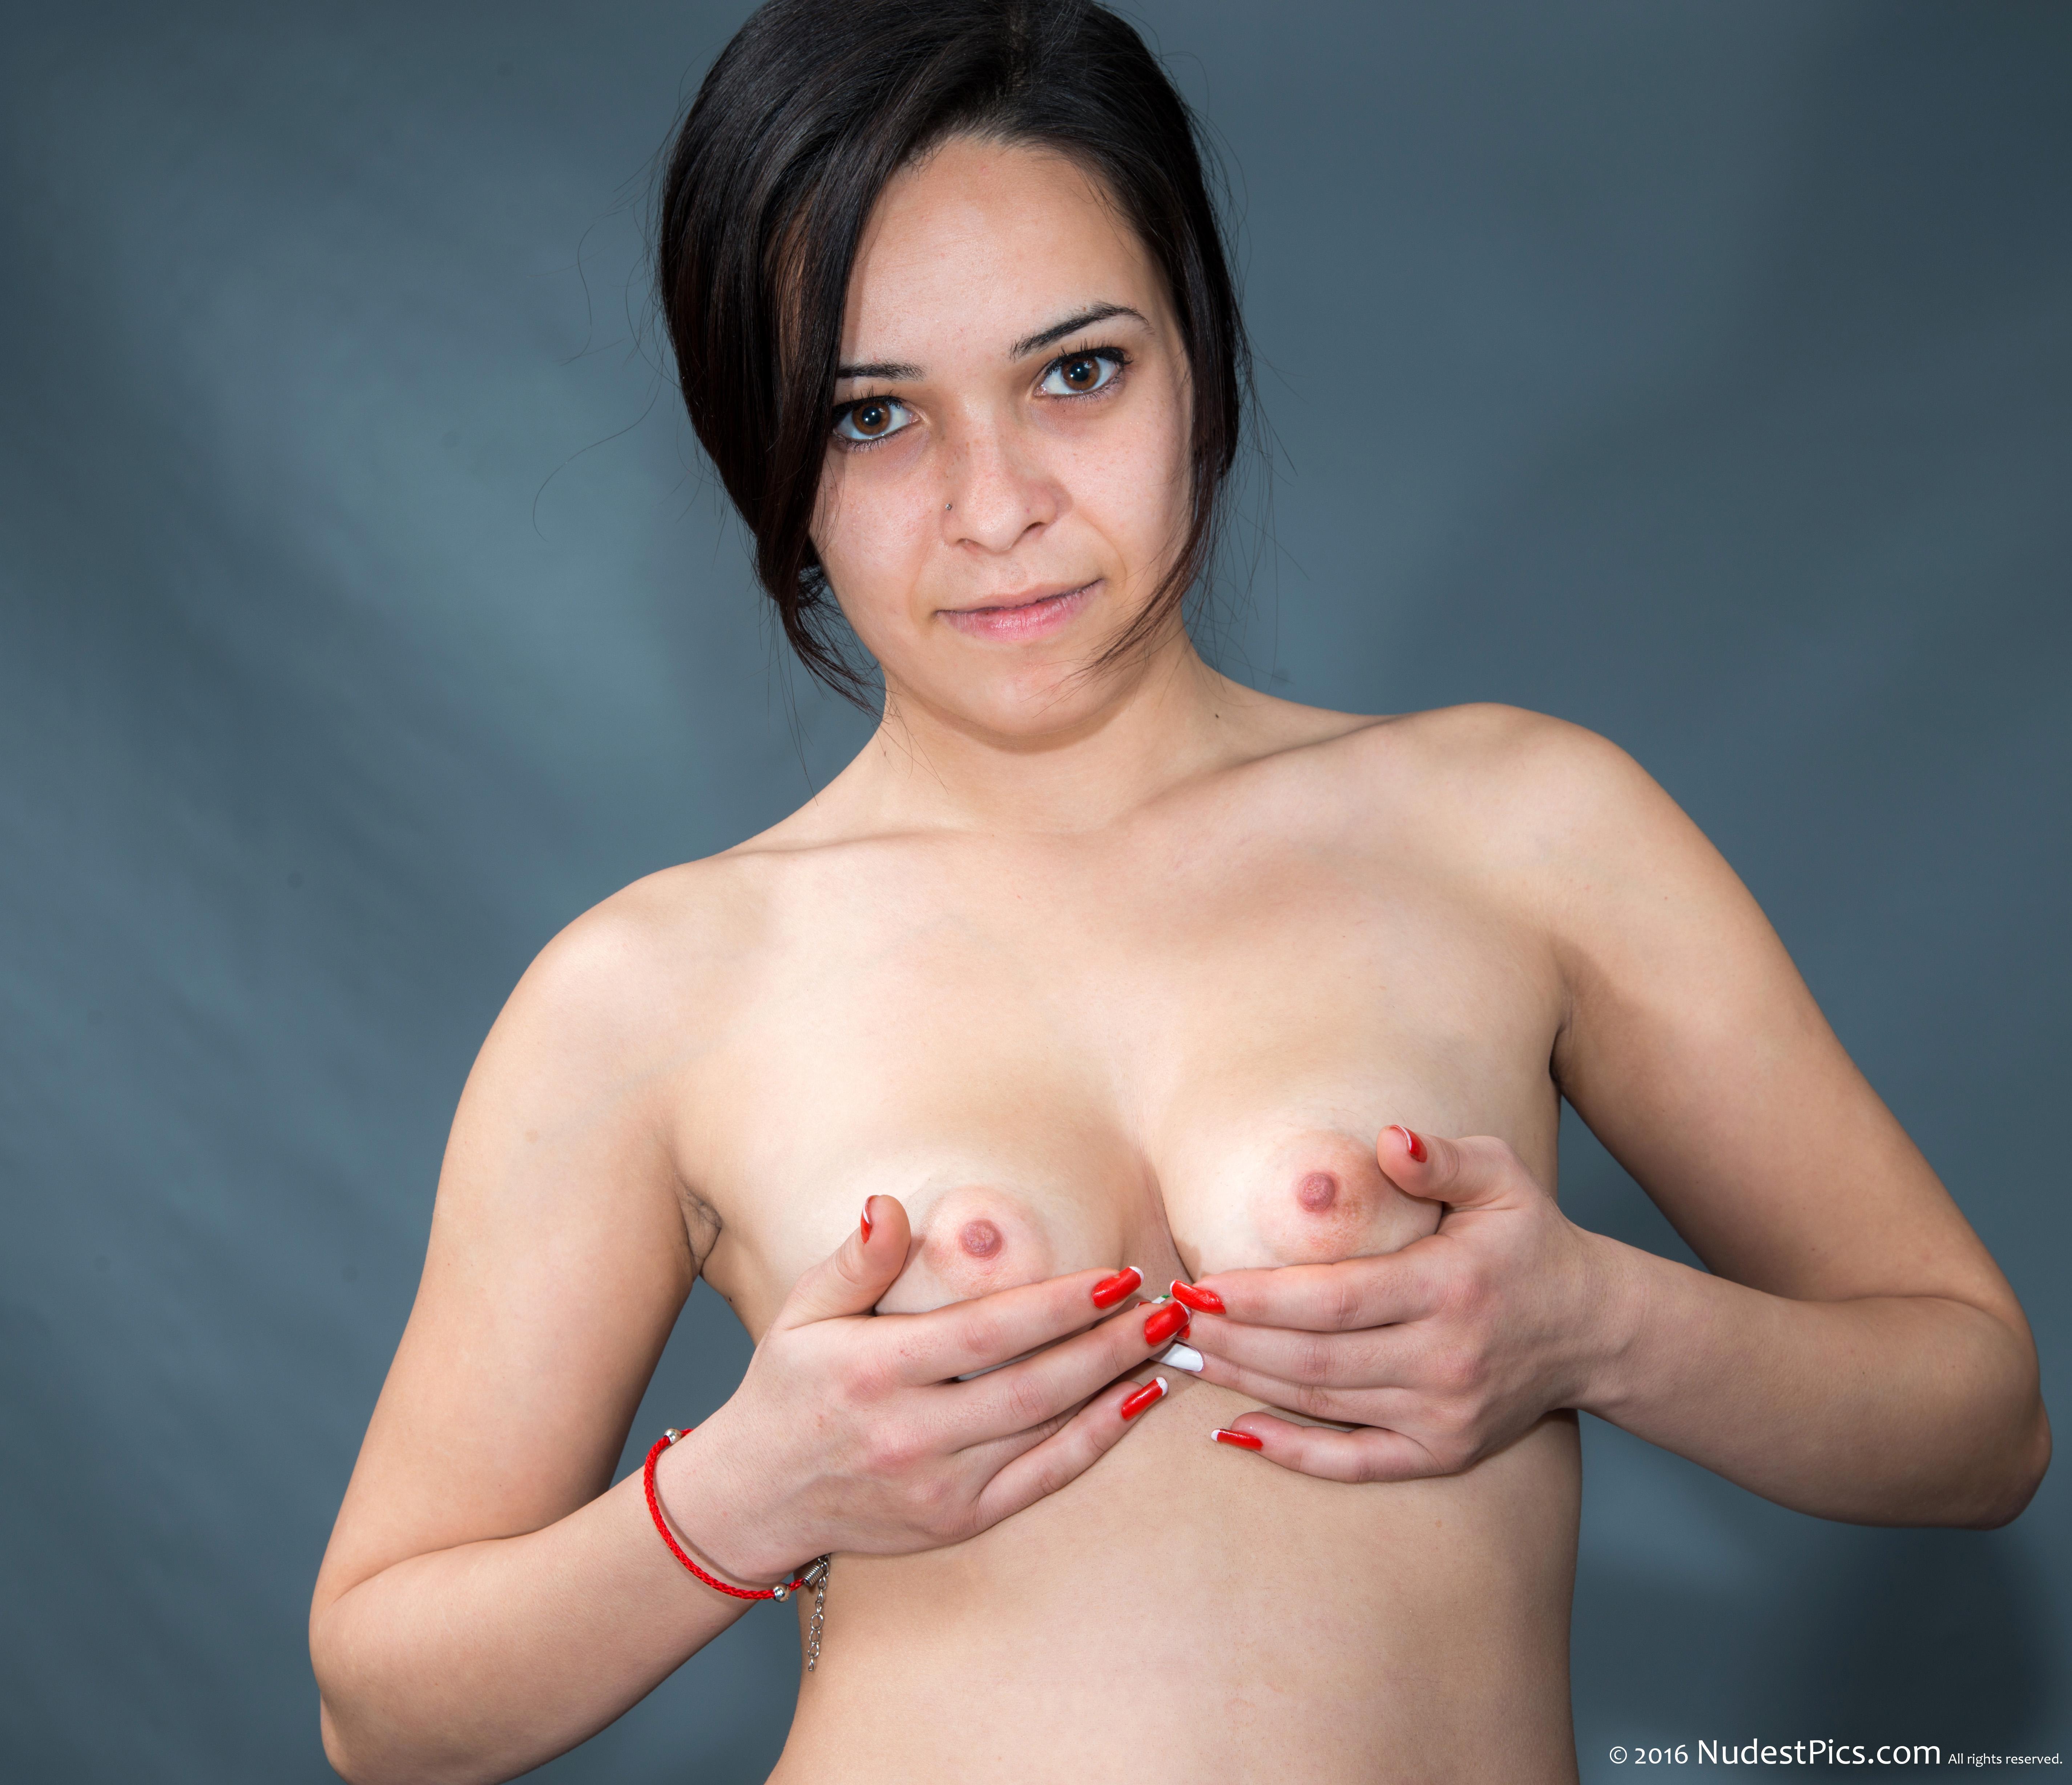 Romanian Teen Girl Holding Small Tits